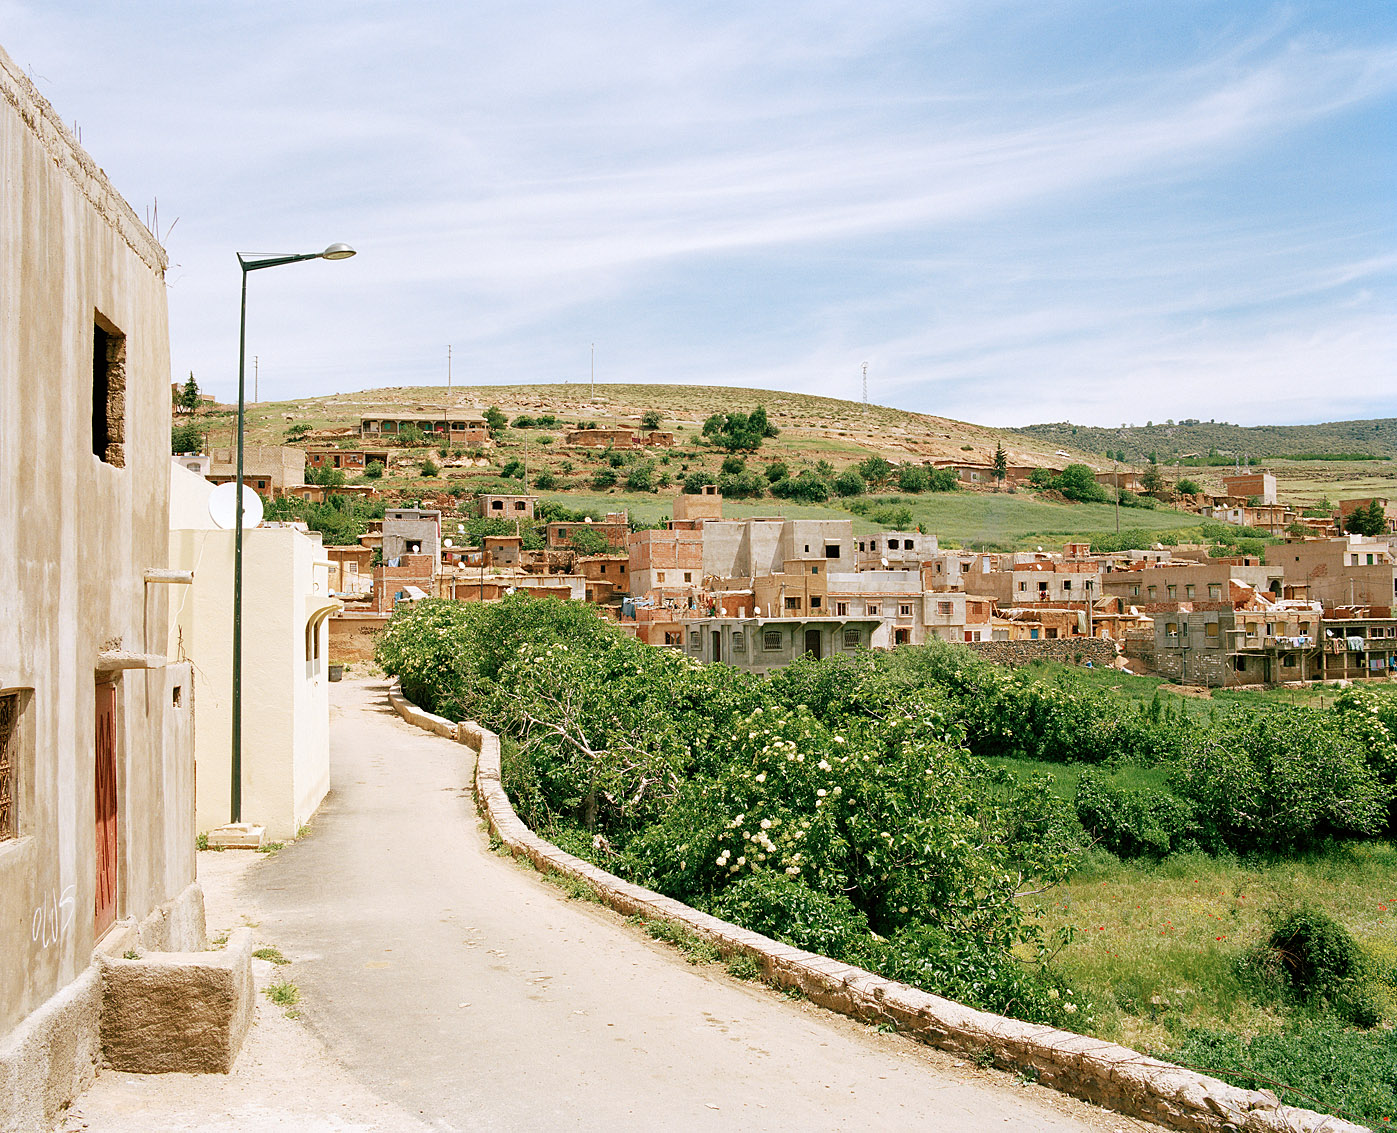 Village de Ben Smim, Maroc.